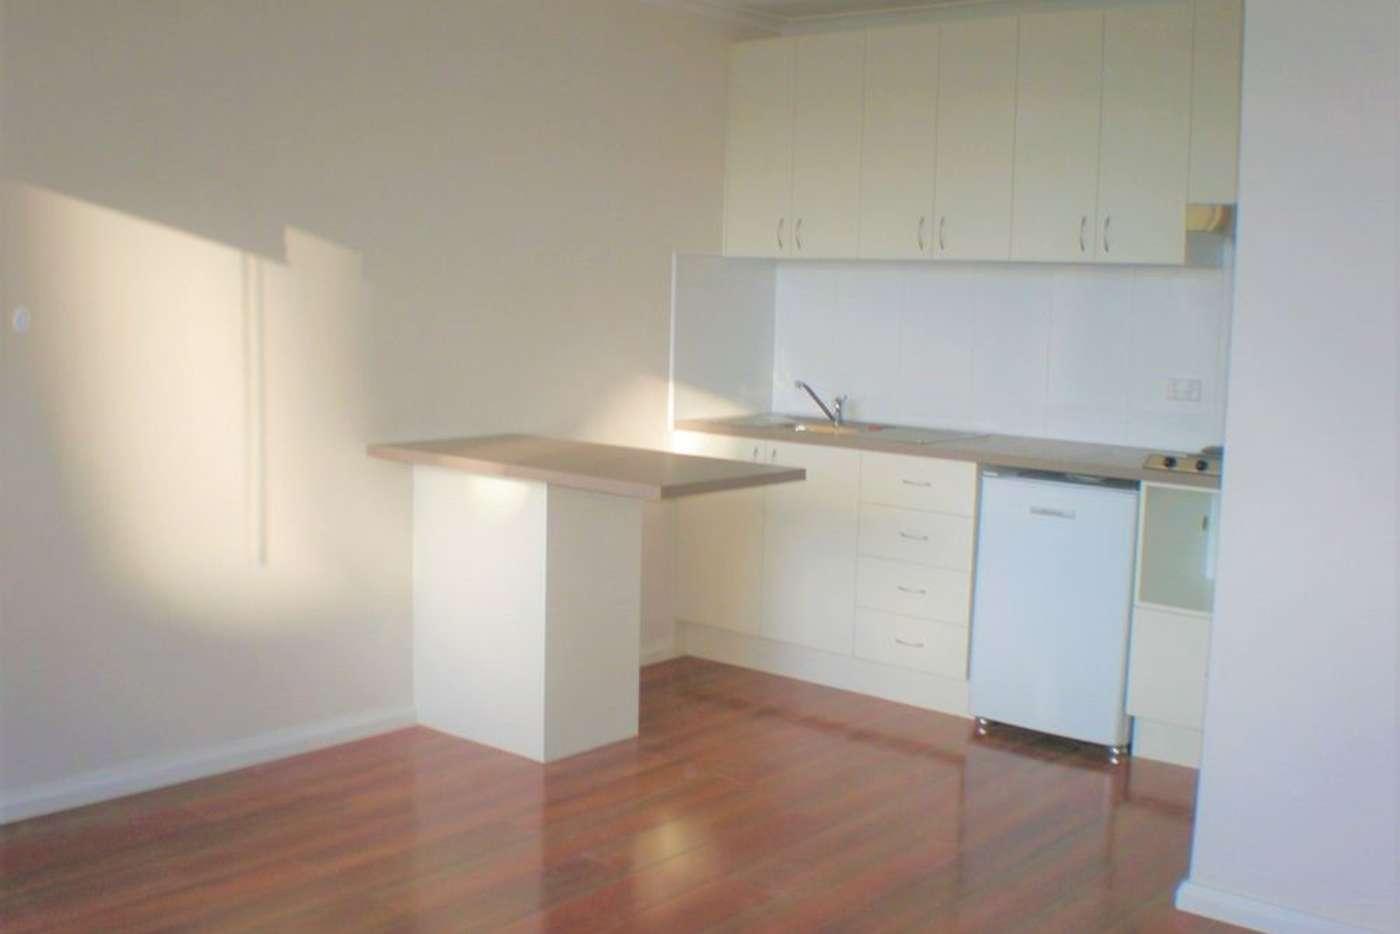 Main view of Homely studio listing, 418/29 Newland Street, Bondi Junction NSW 2022